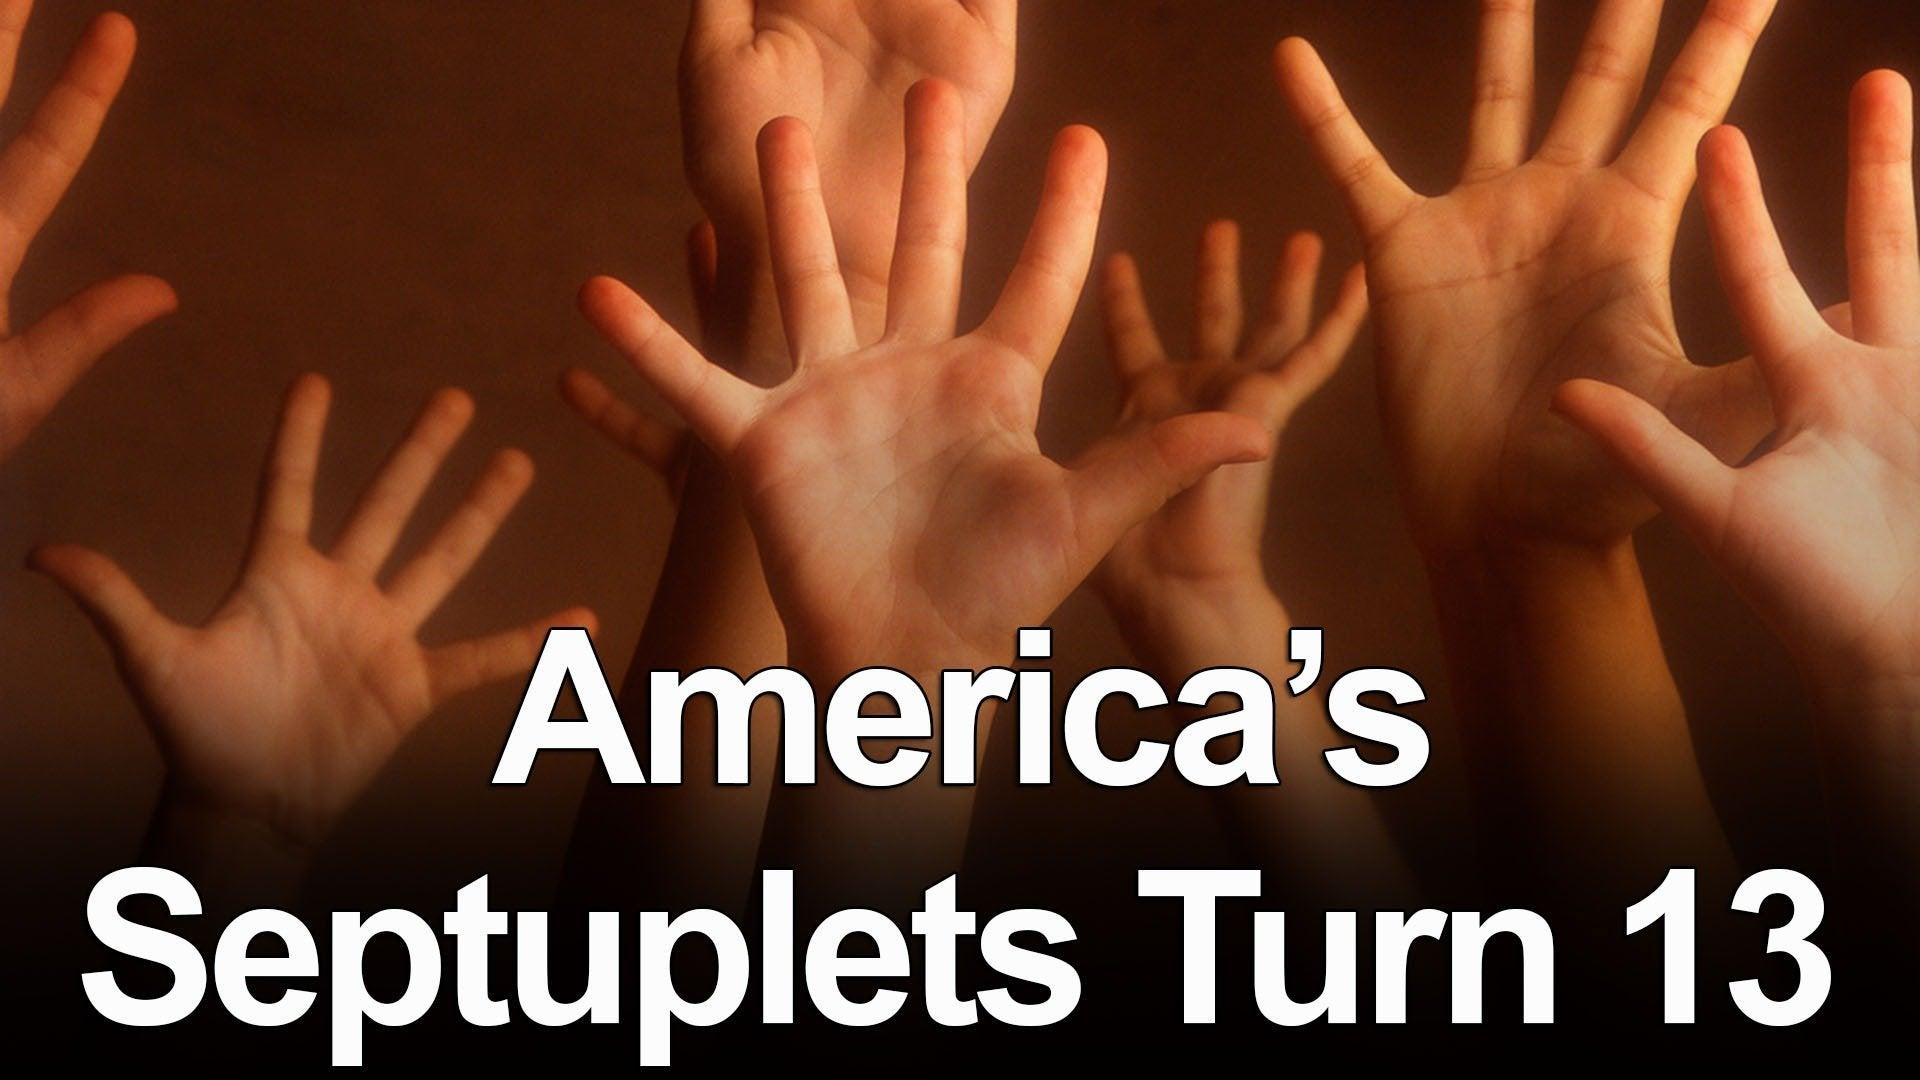 America's Septuplets Turn 13